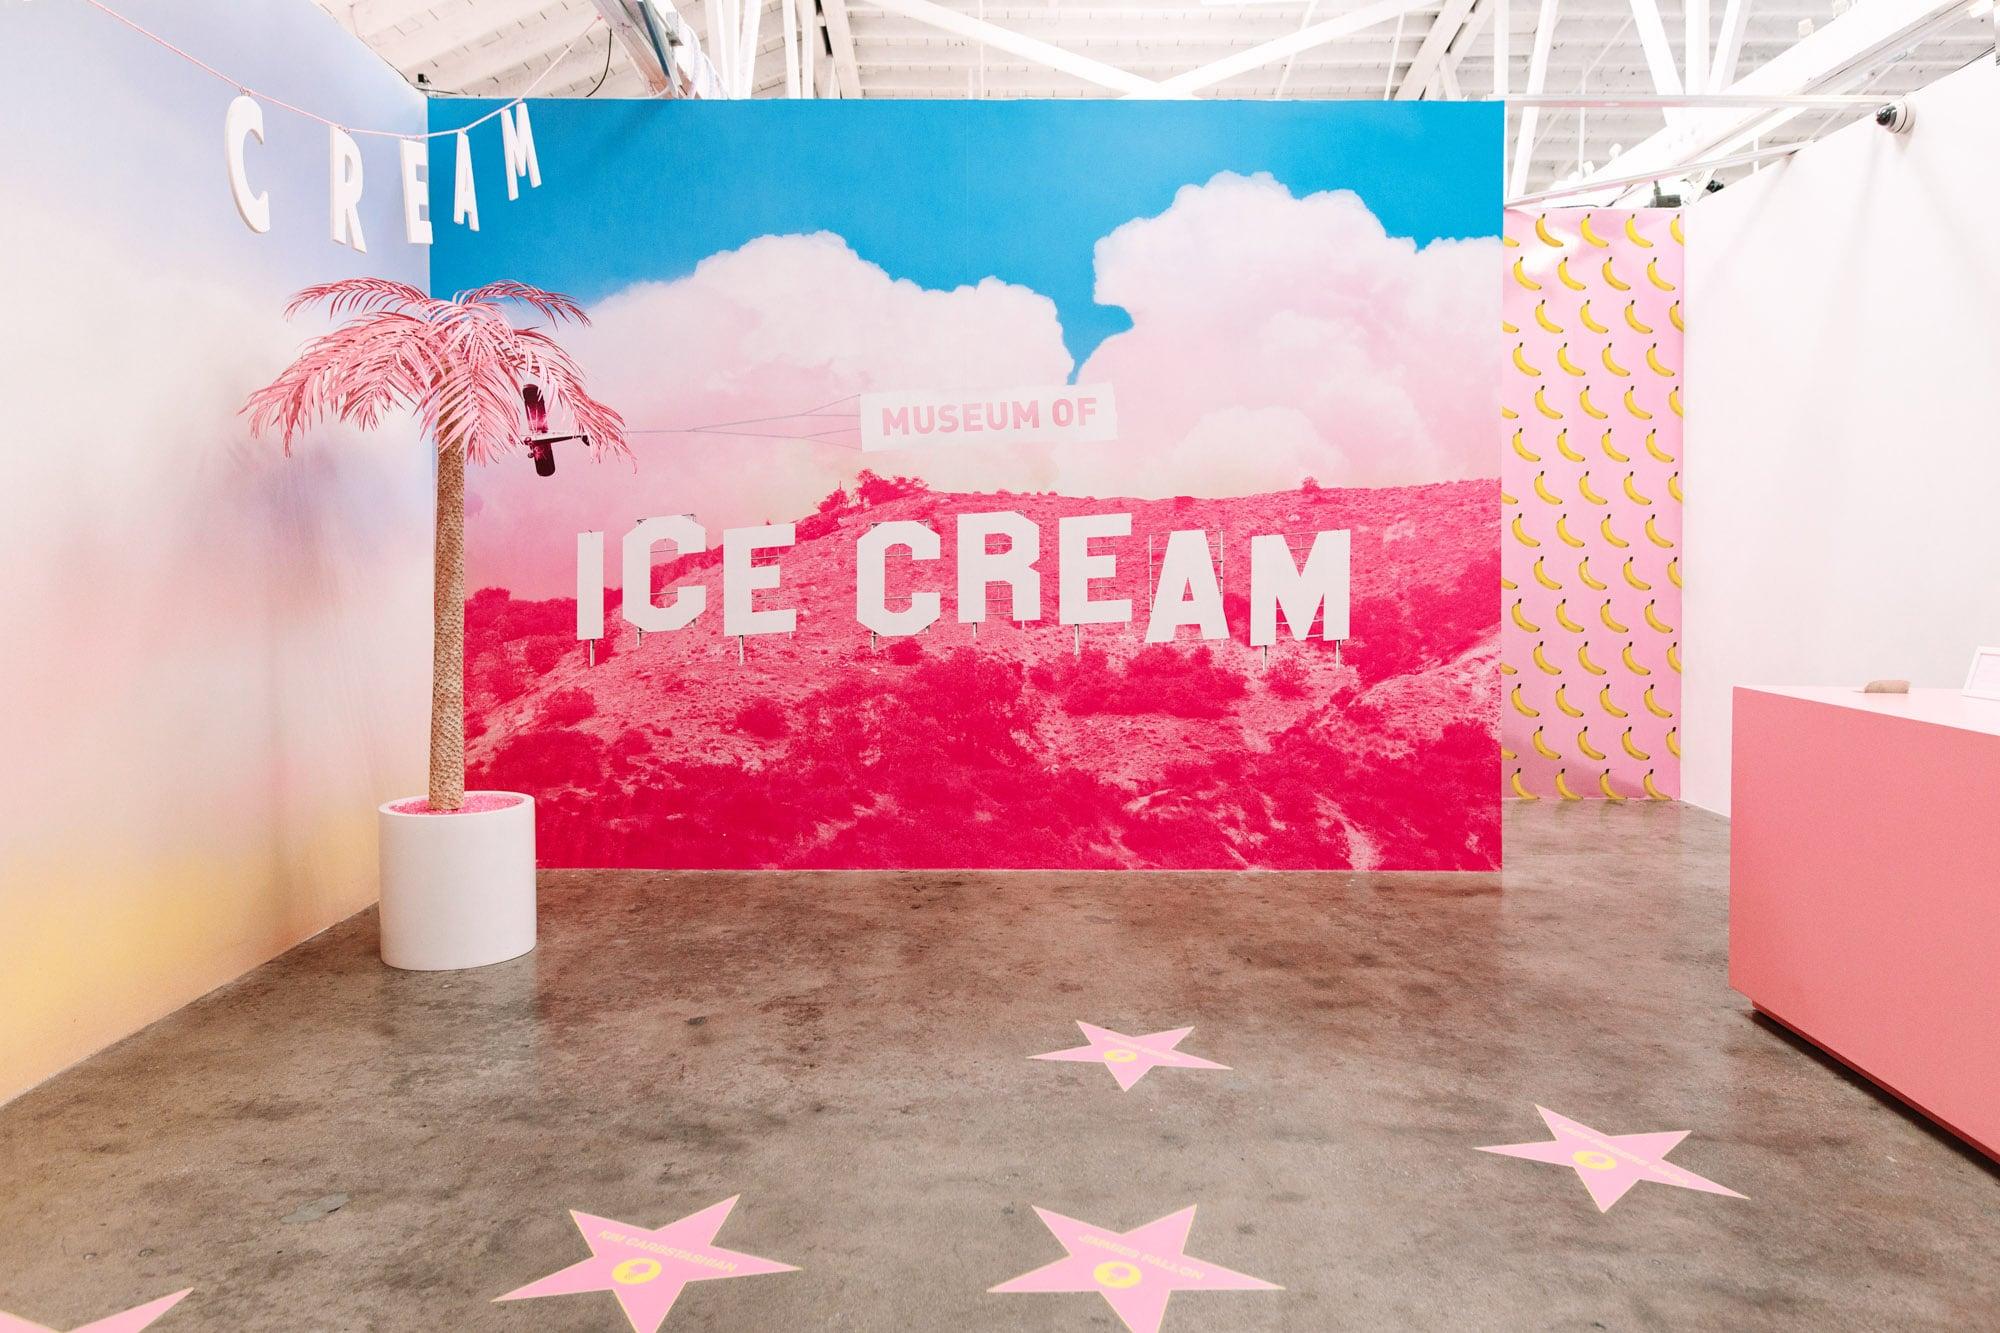 missyonmadison, melissa tierney, fashion blogger, style blogger, la blogger, museum of ice cream, off the shoulder top, charming charlie, pink top, black scuba skirt, scuba skirt, nude ankle strap heels, nude chunky ankle strap heels, bloglovin, hair extensions, hair goals, gigi ny, gigi ny crossbody bag, leather crossbody bag, pink wall, wall crawl, ice cream museum, museum of ice cream los angeles, dtla,